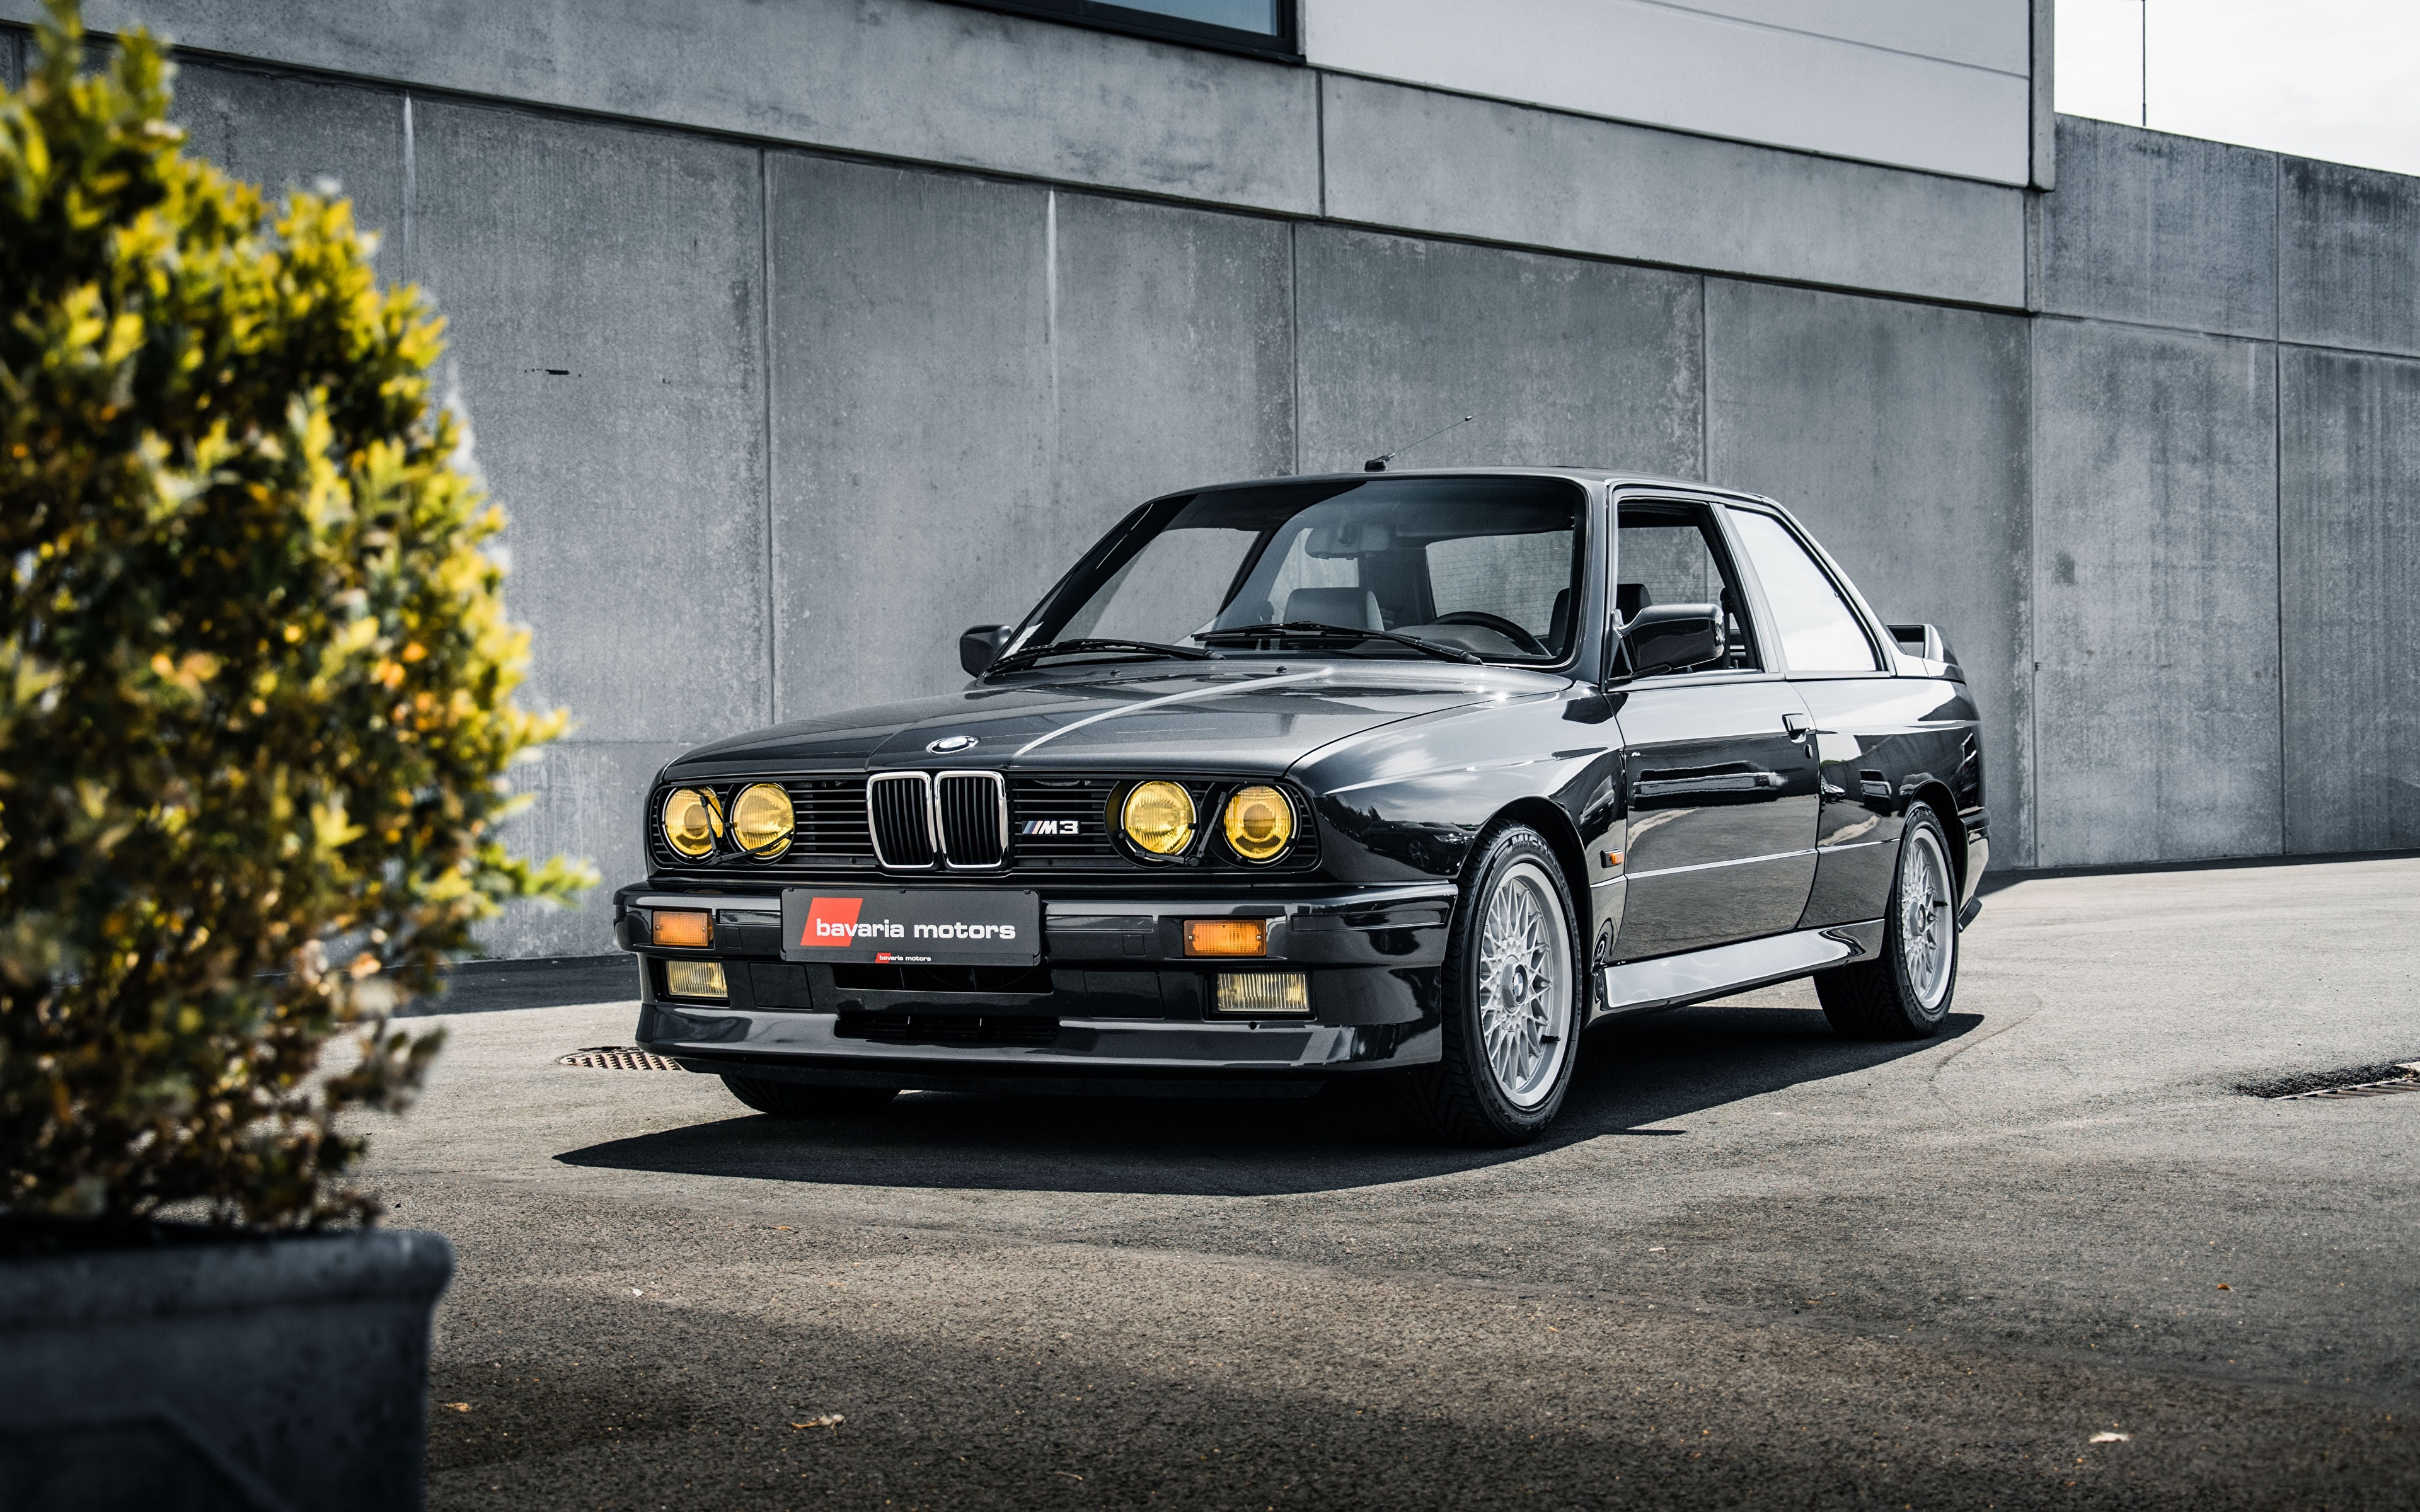 Desktop Wallpapers Bmw E30 3 Series M3 Coupe Black Cars 3840x2400